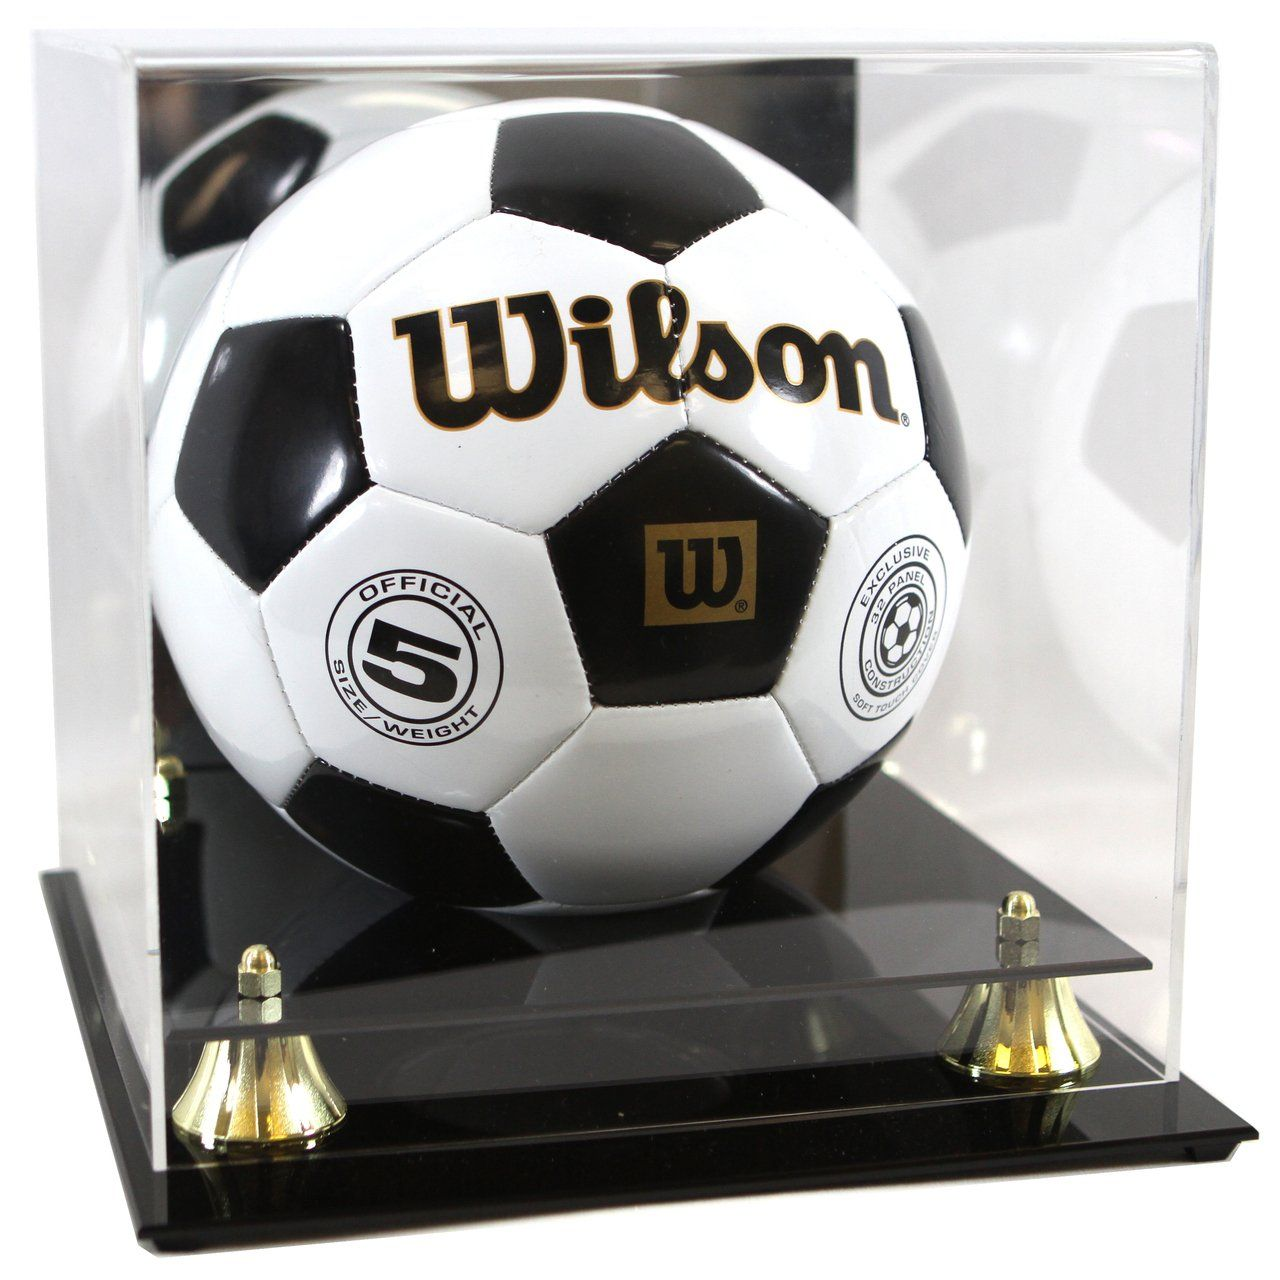 Soccer Or Volleyball Premium Display Case With Gold Risers Futbolnyj Myach I Futbol